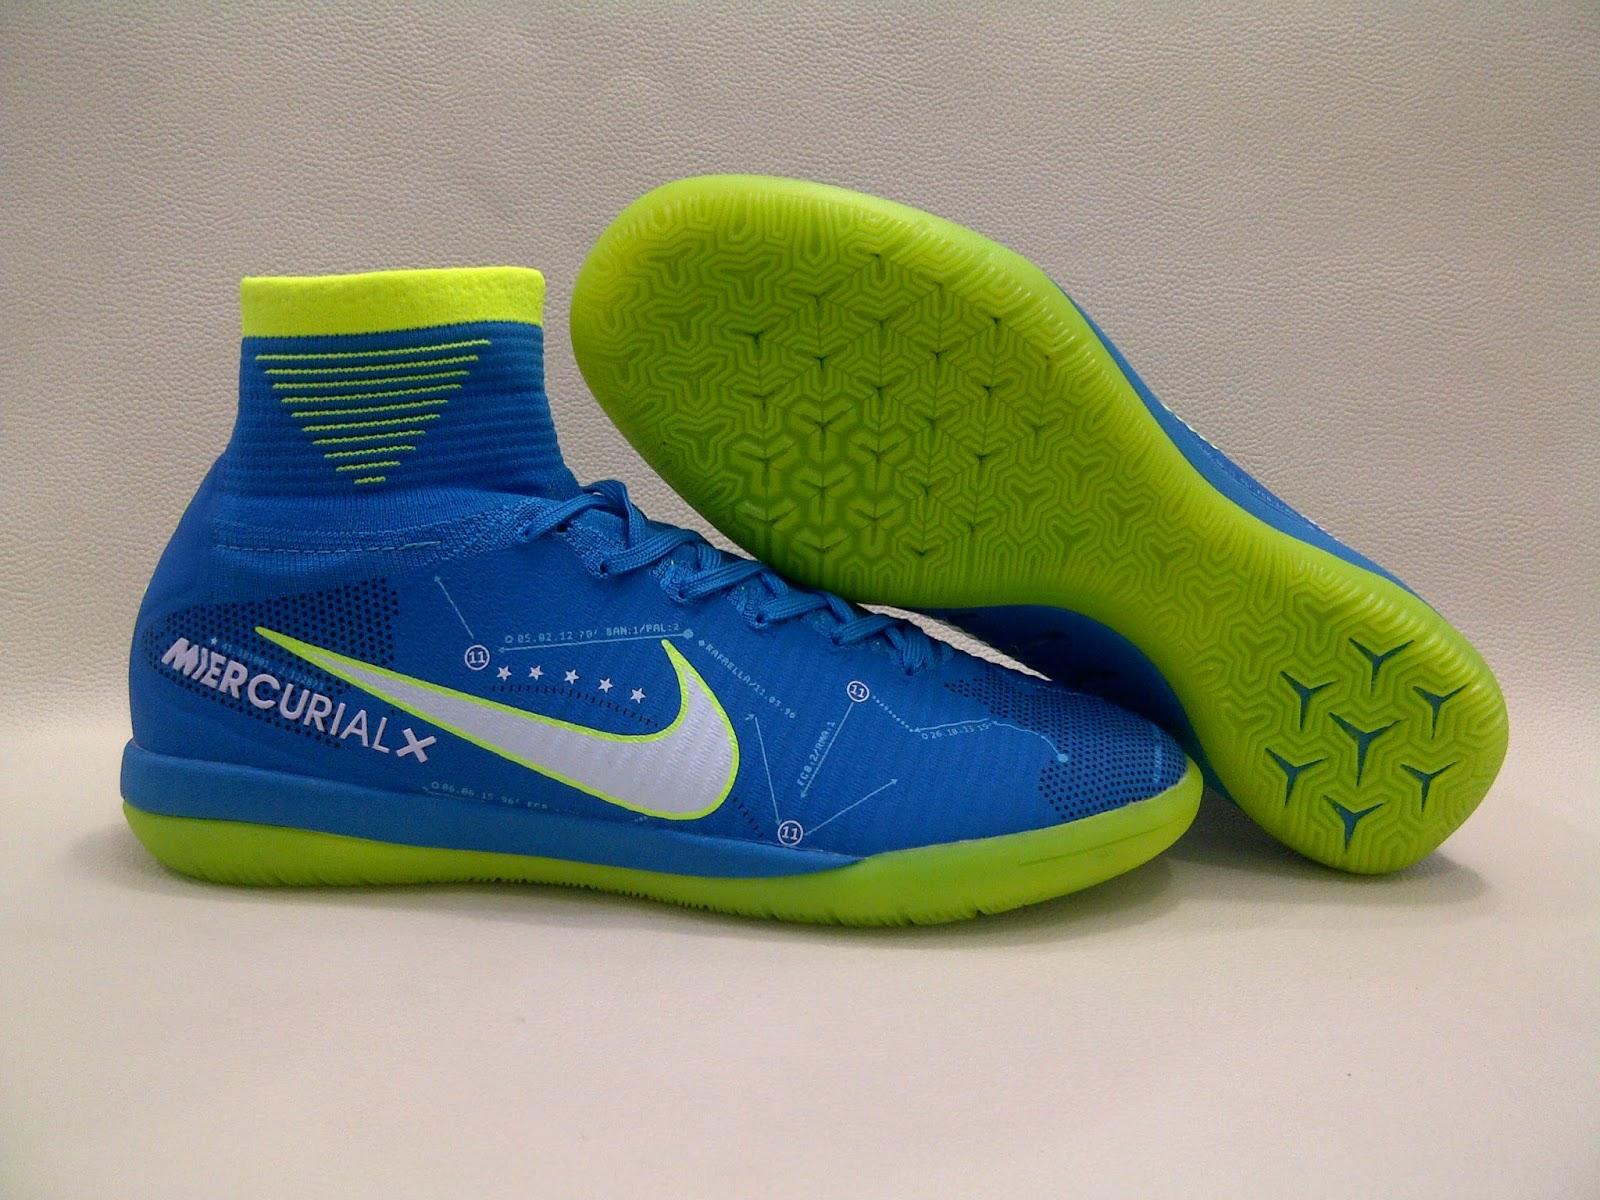 price reduced reliable quality quality 296decfccc sepatu futsal nike mercurial x proximo ii red fire ic ...